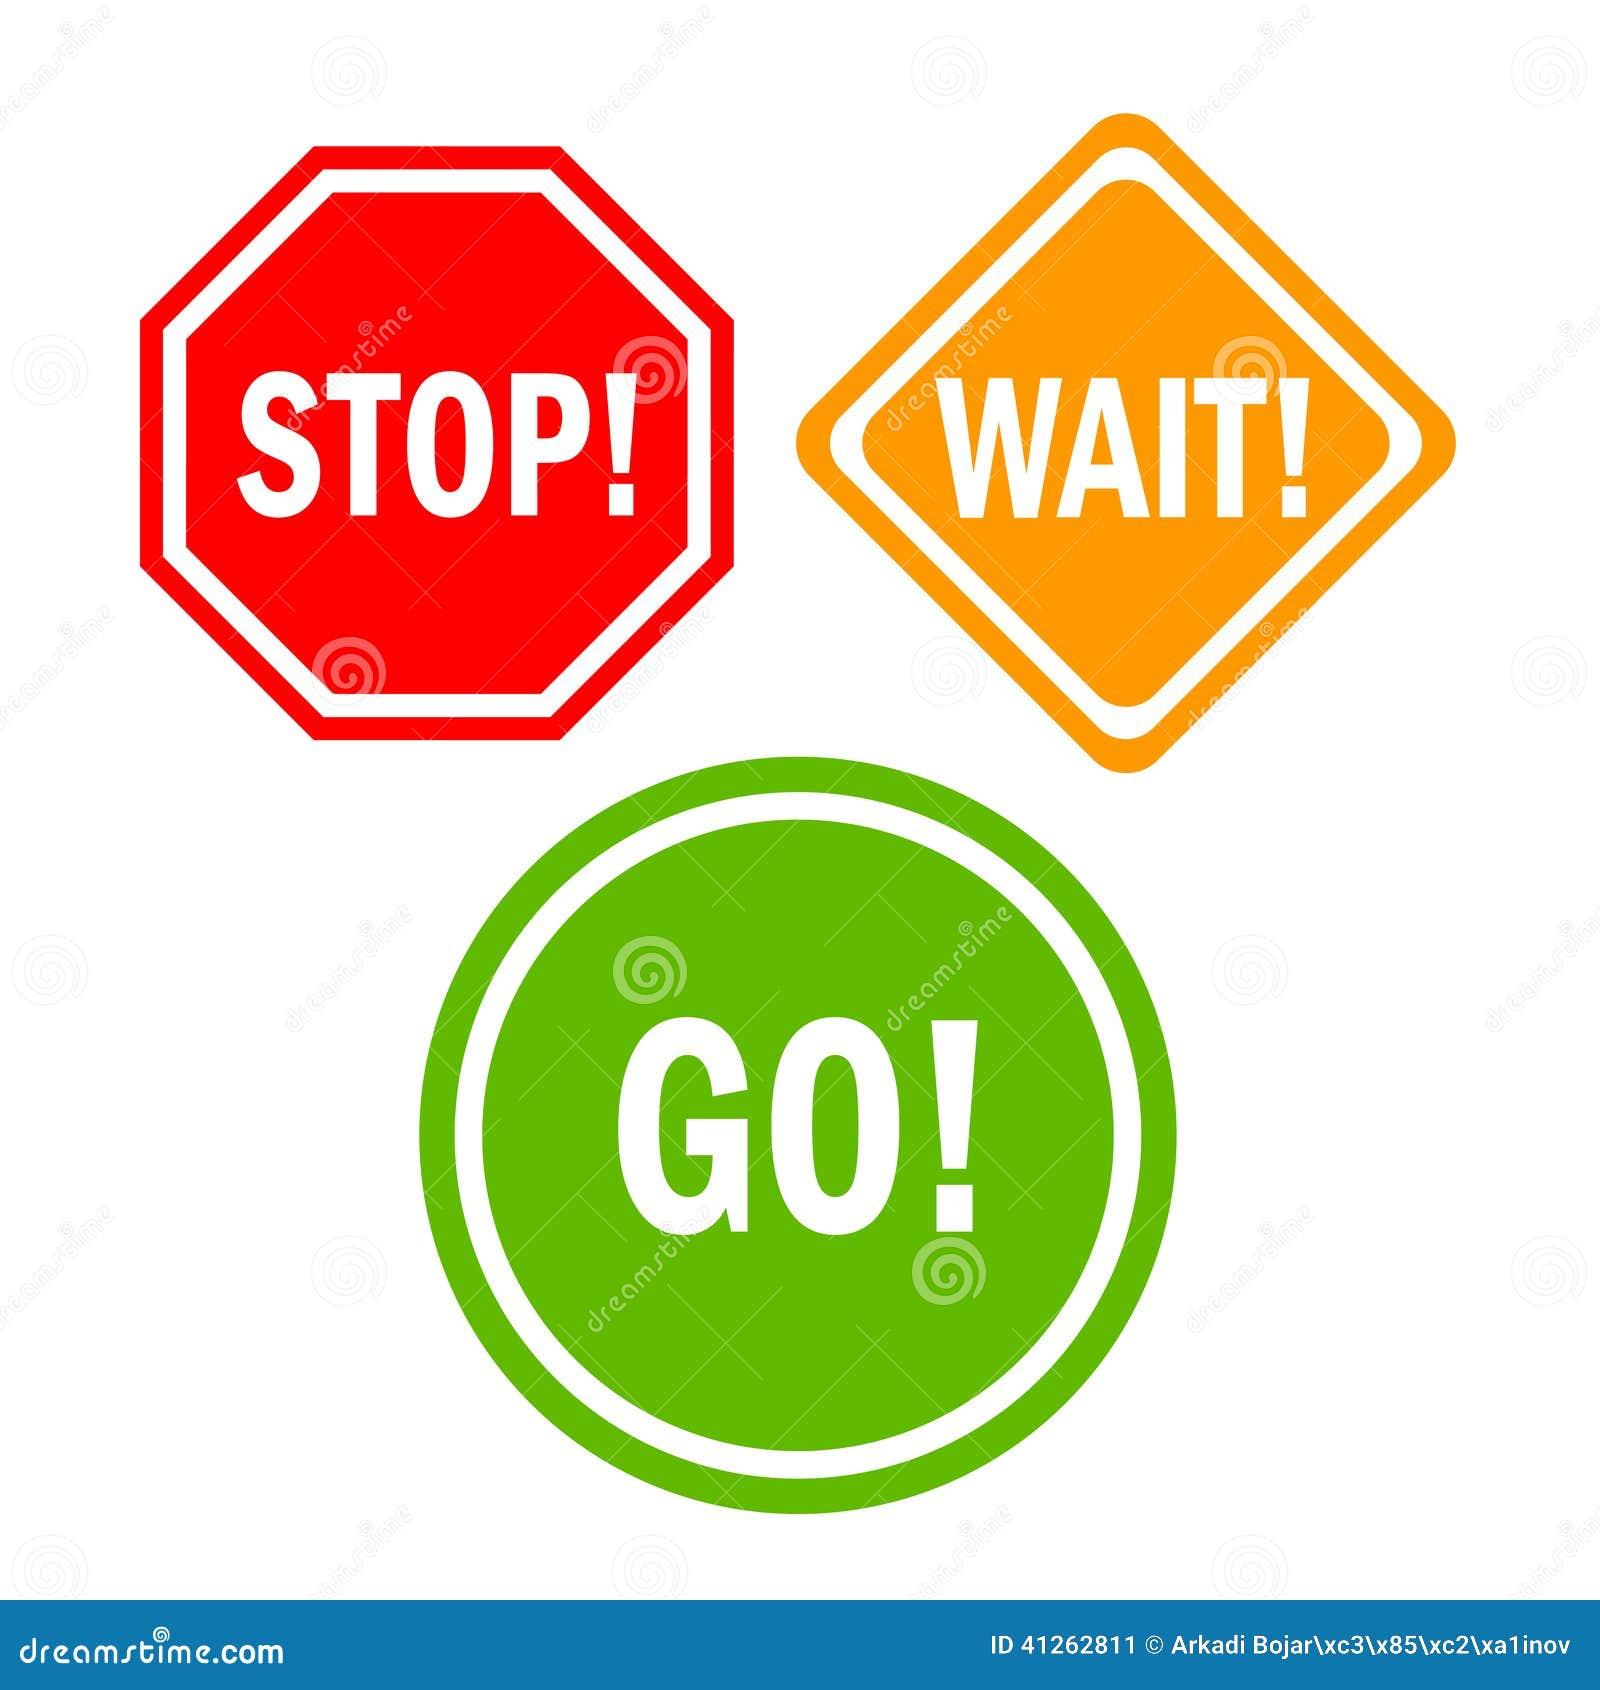 stop wait go sign stock vector illustration of closed 41262811. Black Bedroom Furniture Sets. Home Design Ideas